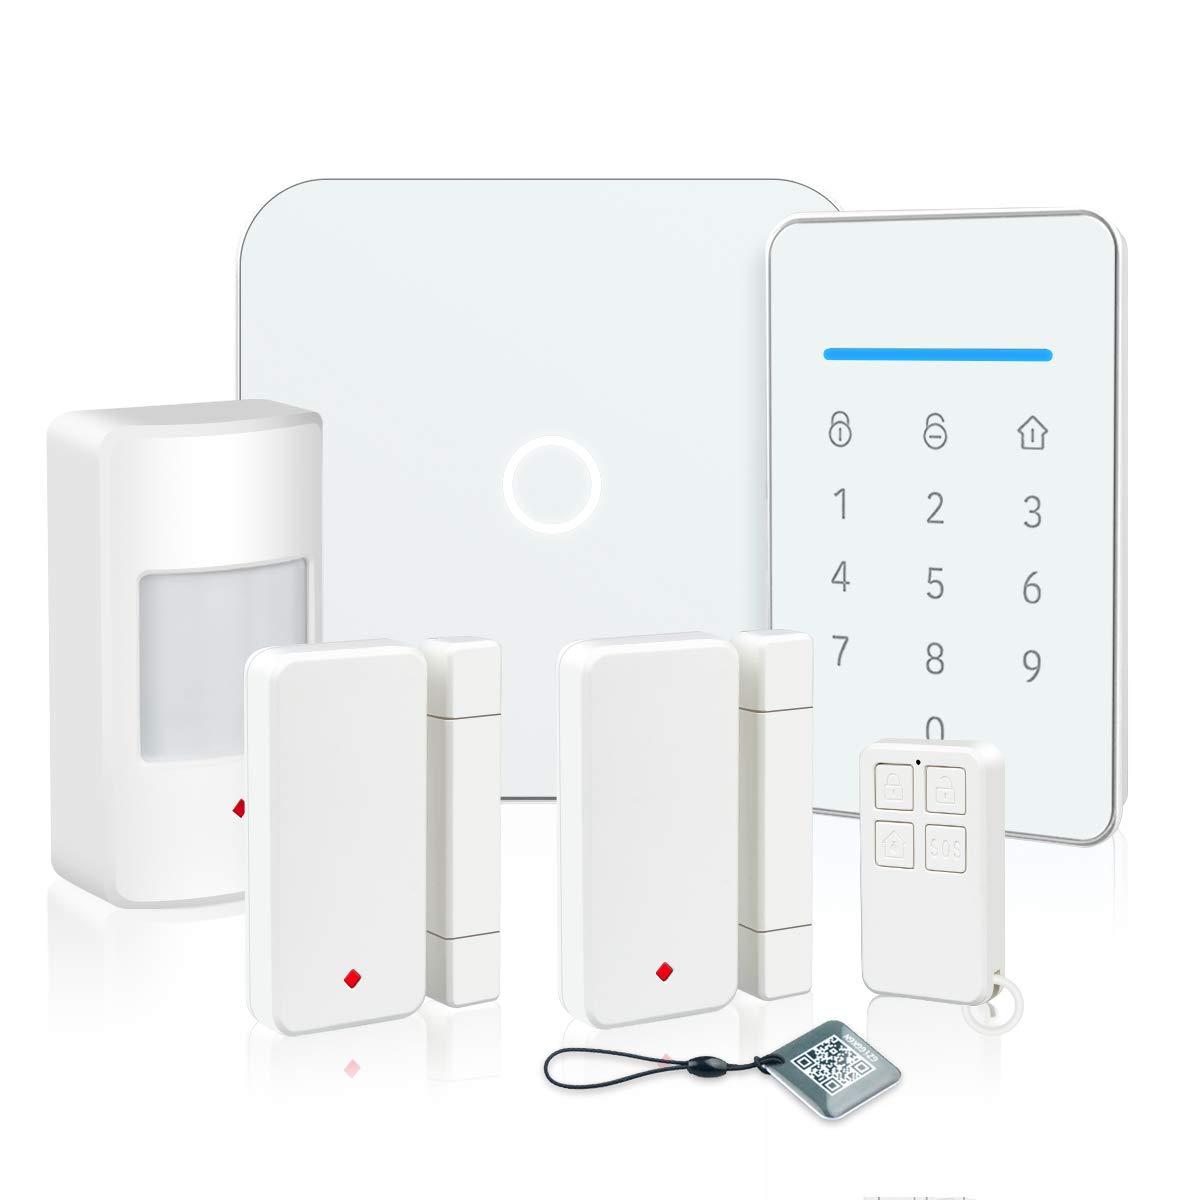 LarmTek Smart Wi-Fi Alarm System with, Alarm Host, Motion Sensor and Remote Smart Phone Control, IP Camera(Optional,Wireless LAN Wi-Fi GSM Cellular ...